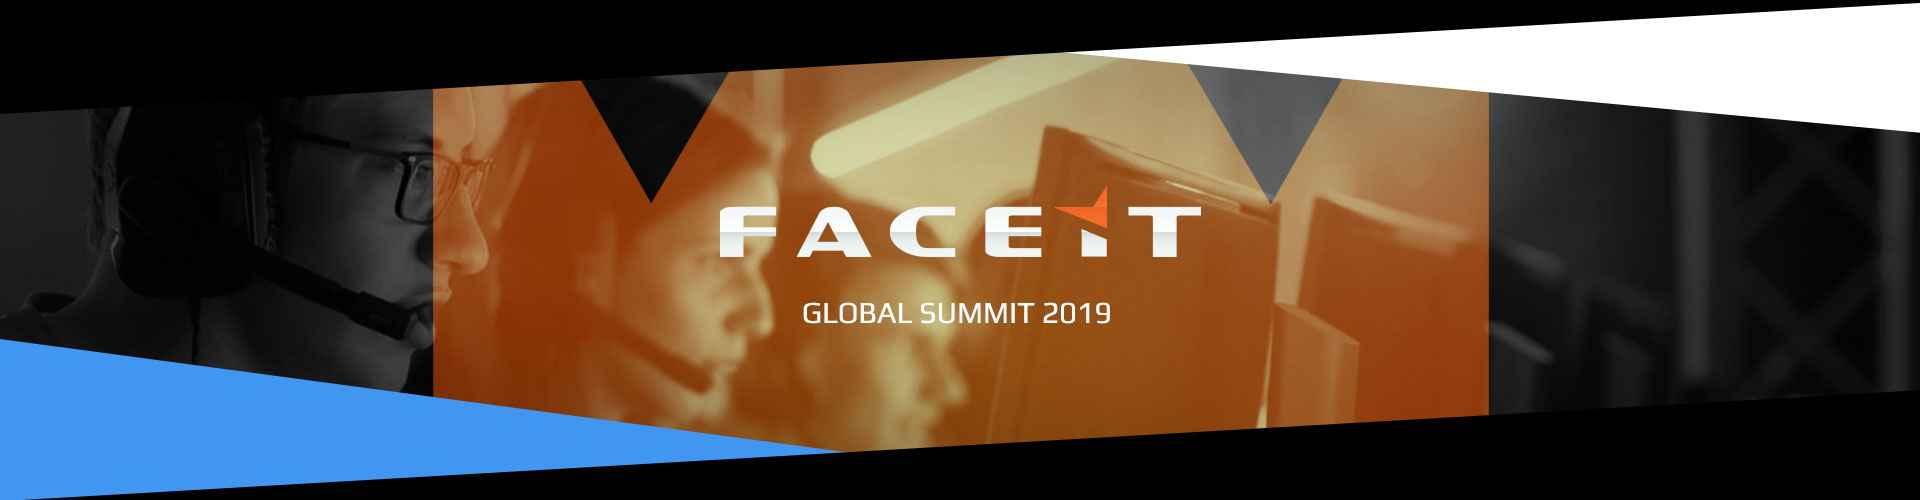 PUBG FACEIT Global Summit 2019